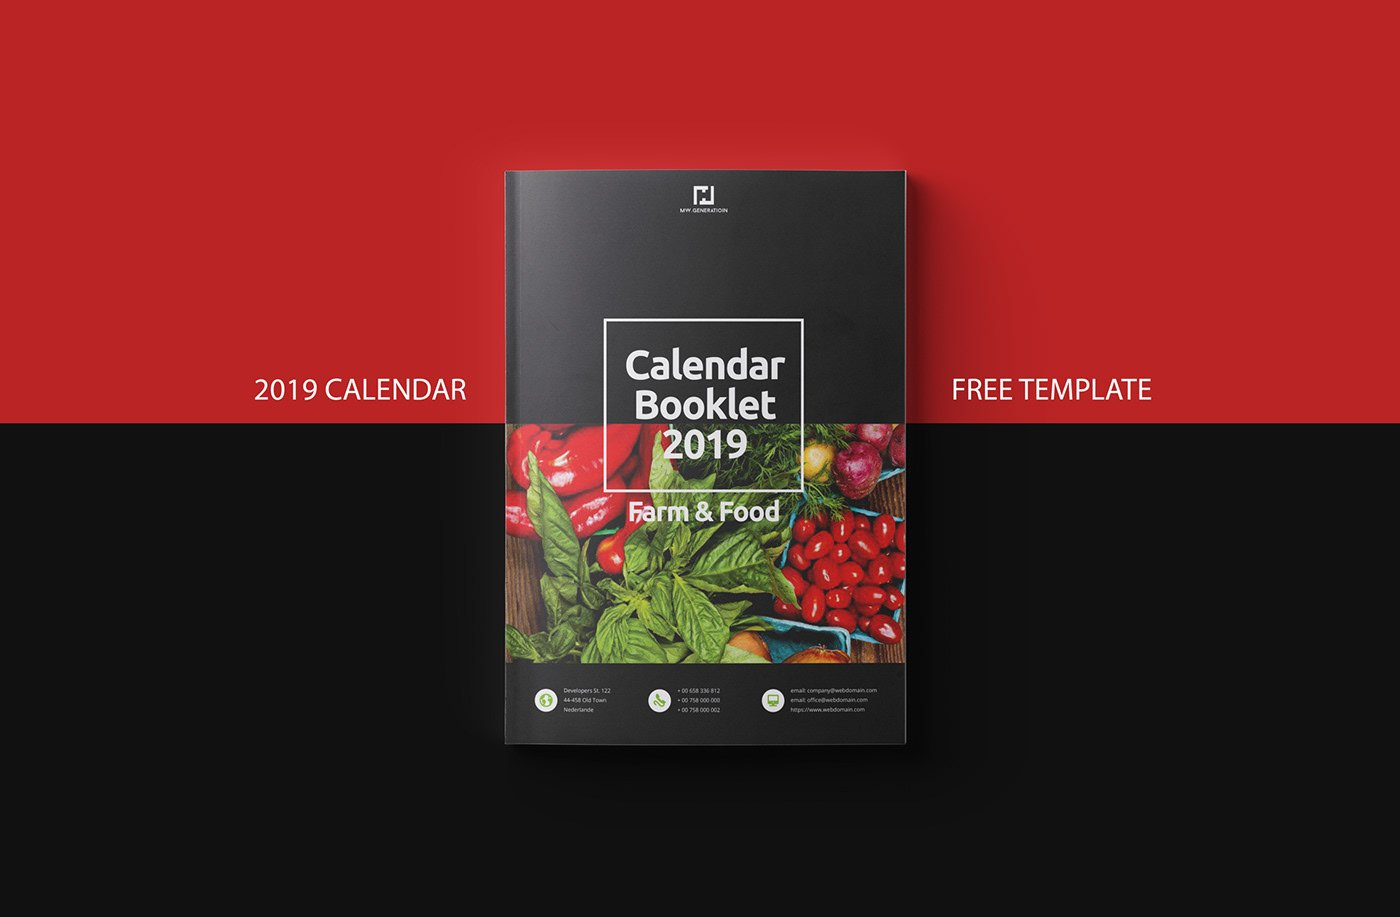 Free Calendar 2019 Indesign Template On Behance Calendar 2019 Indesign